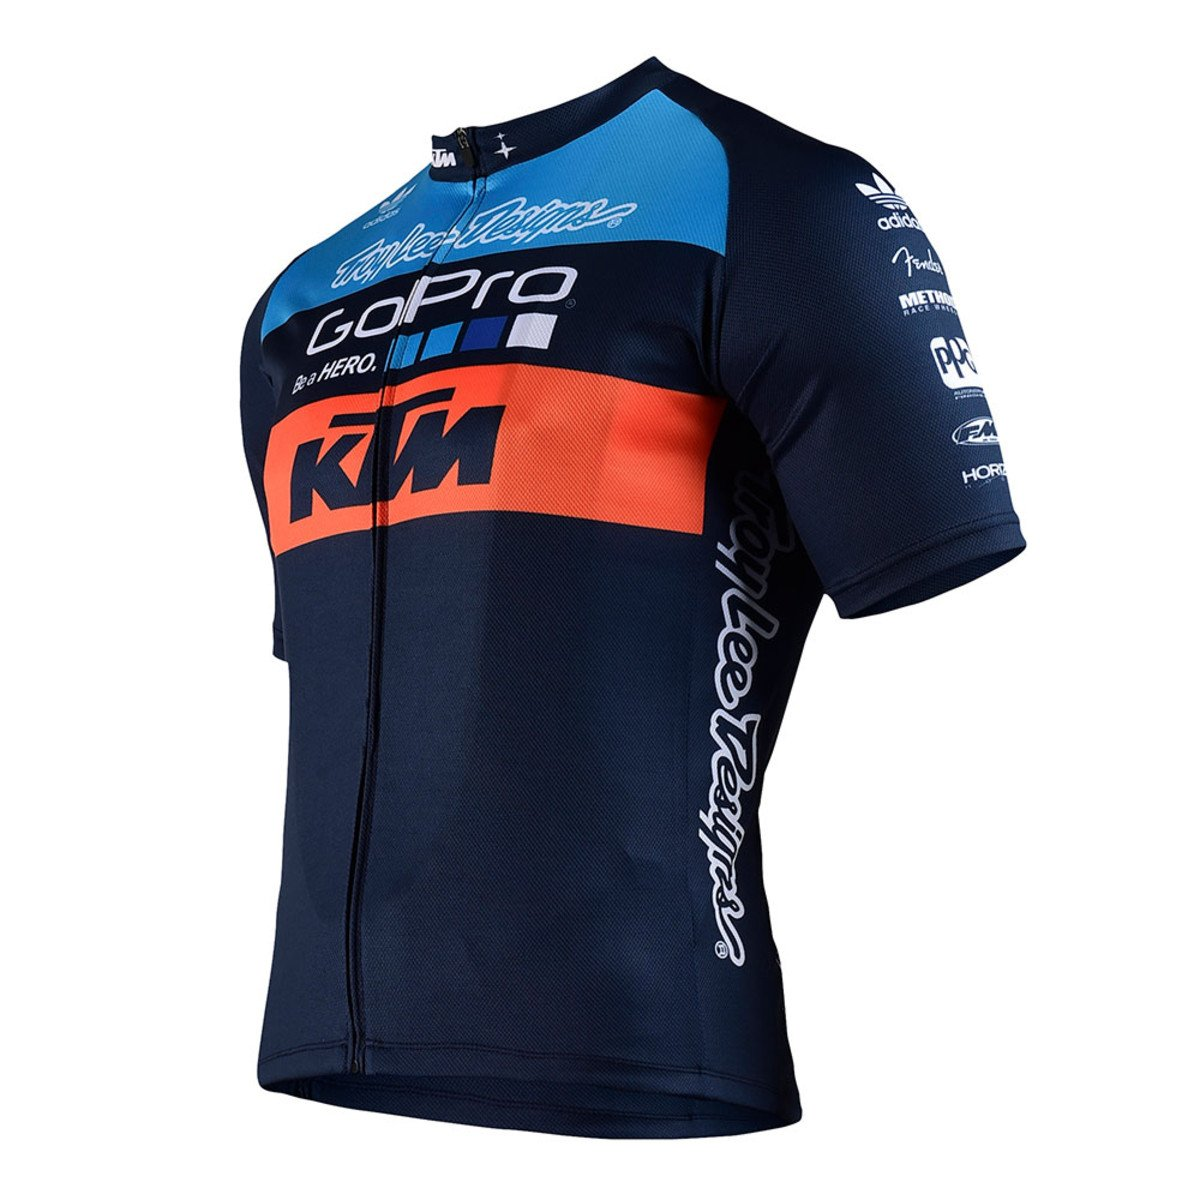 Troy Lee Designs KTM チーム メンズ ジップアップ 自転車 ジャージ ネイビーブルー/オレンジ MD   B01L0JNLIC